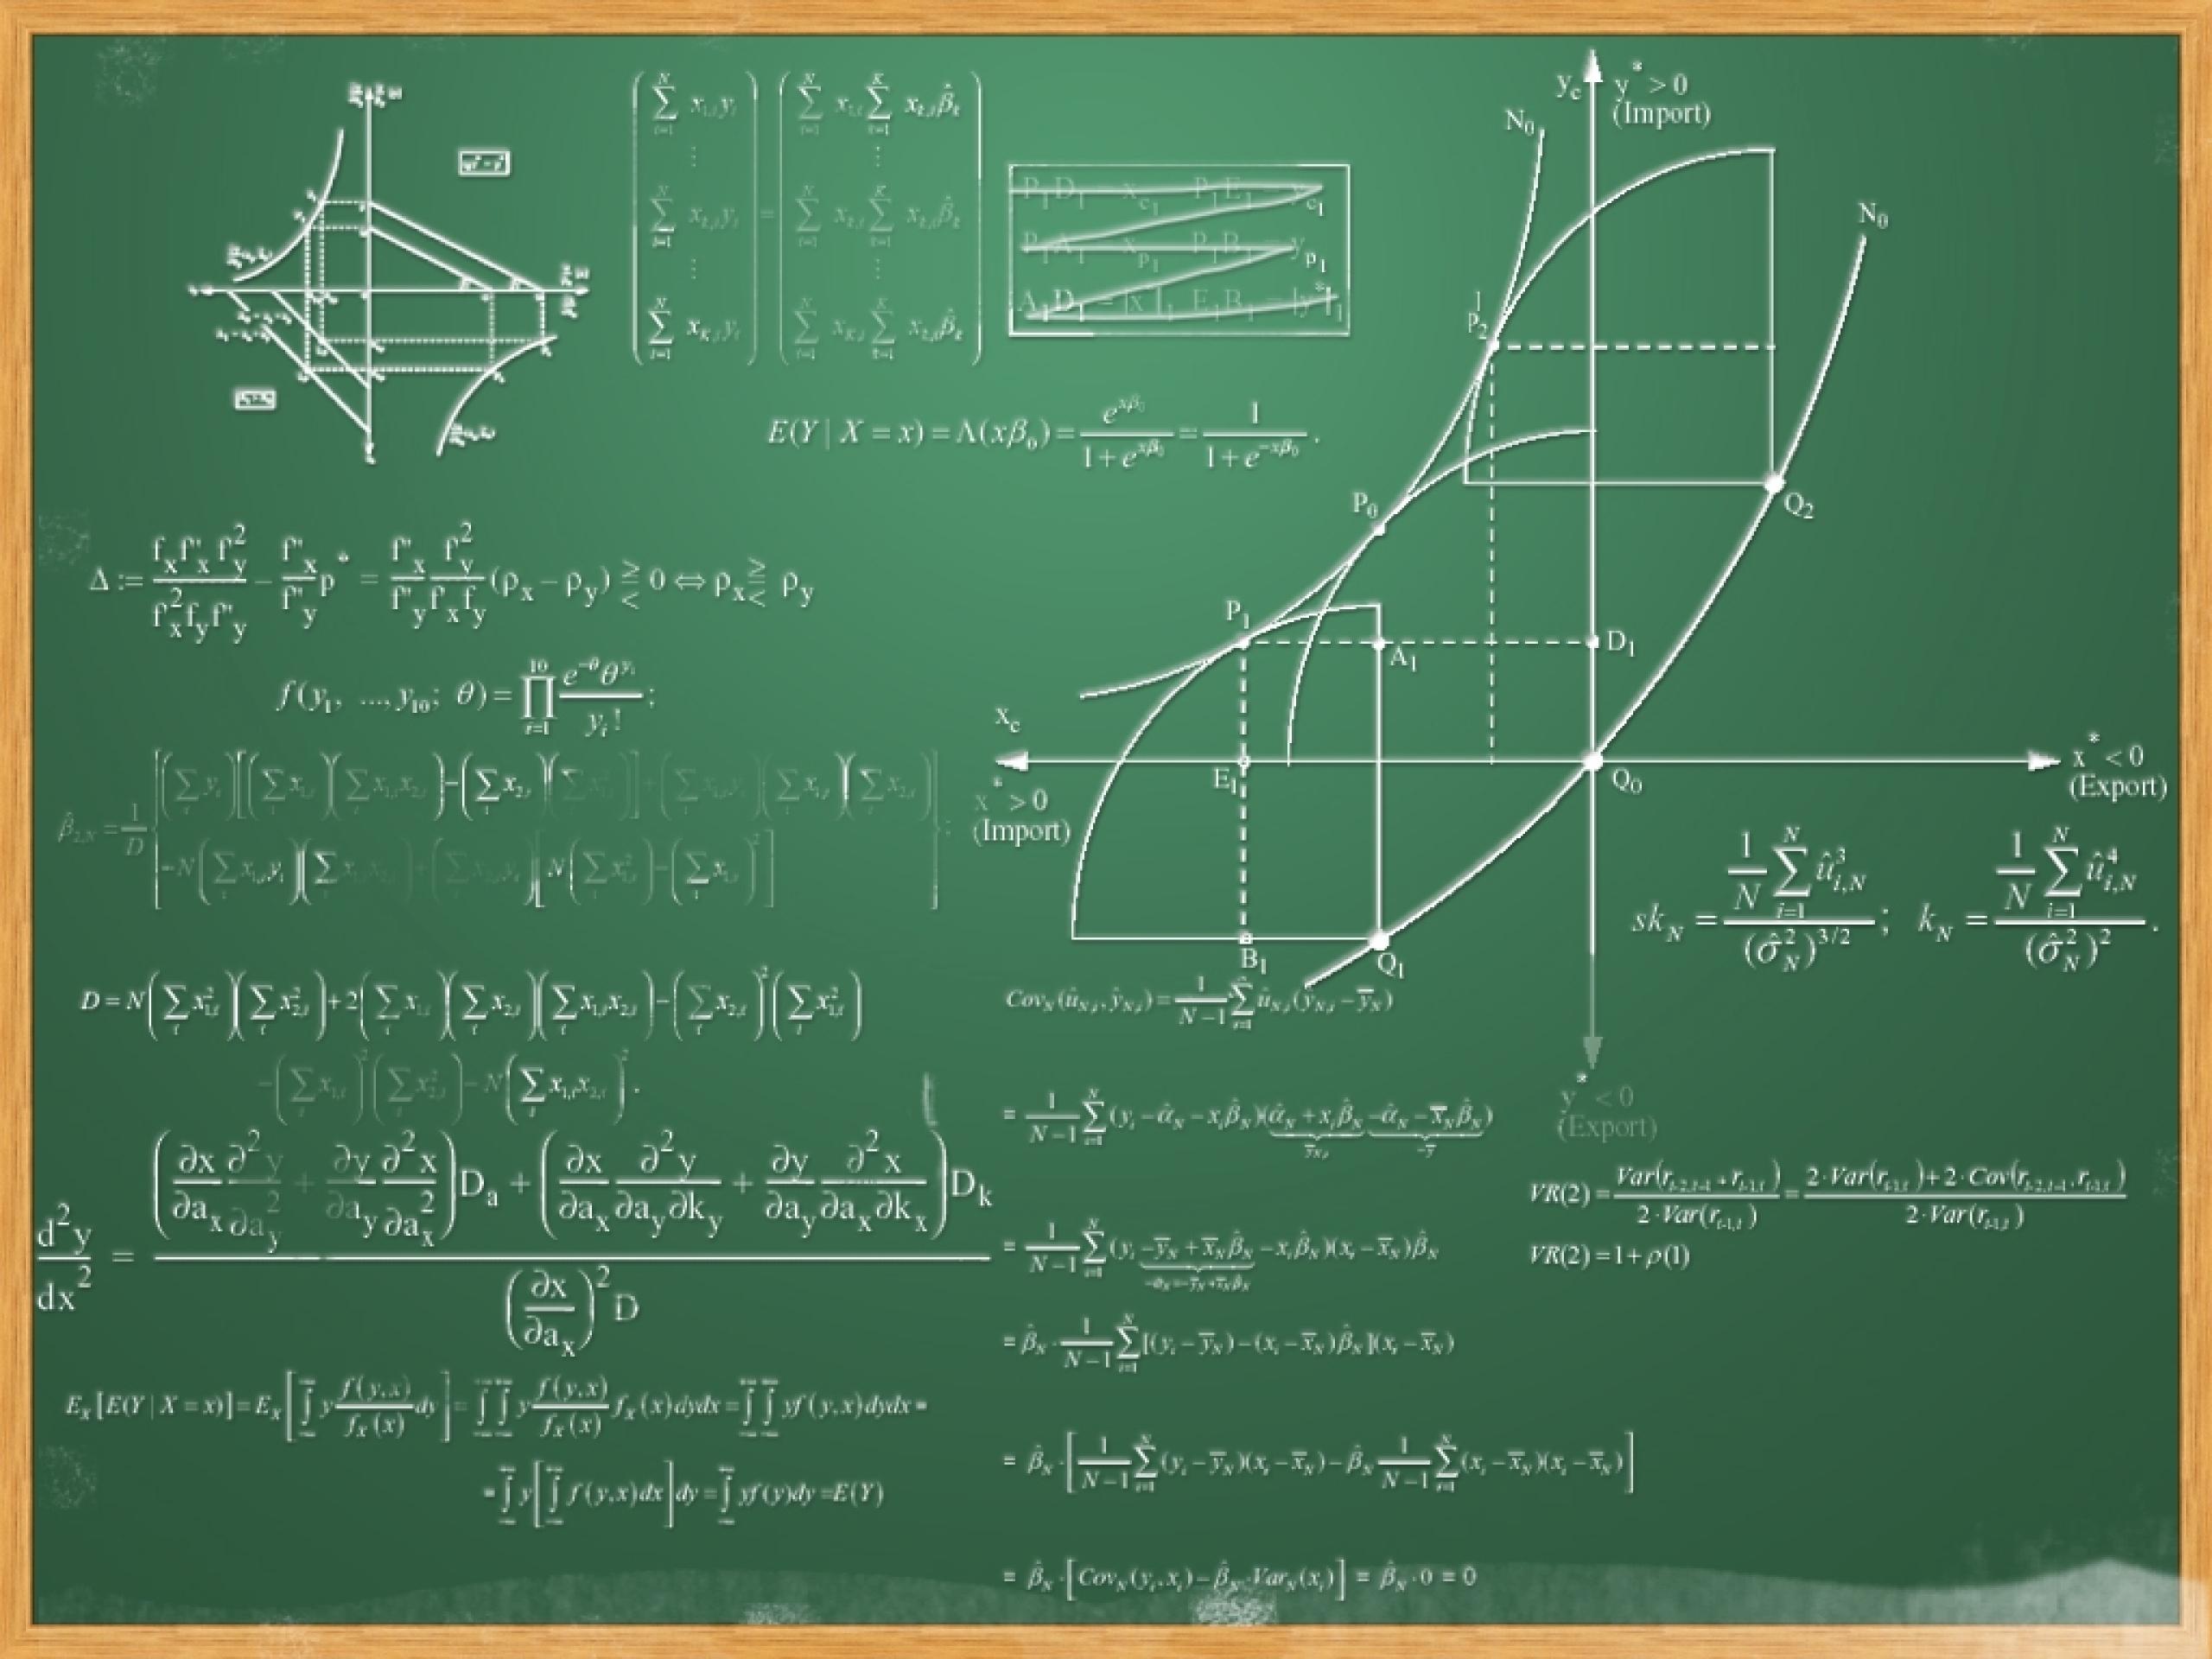 chalkboards equation mind 1024x768 wallpaper Wallpaper 2560x1920